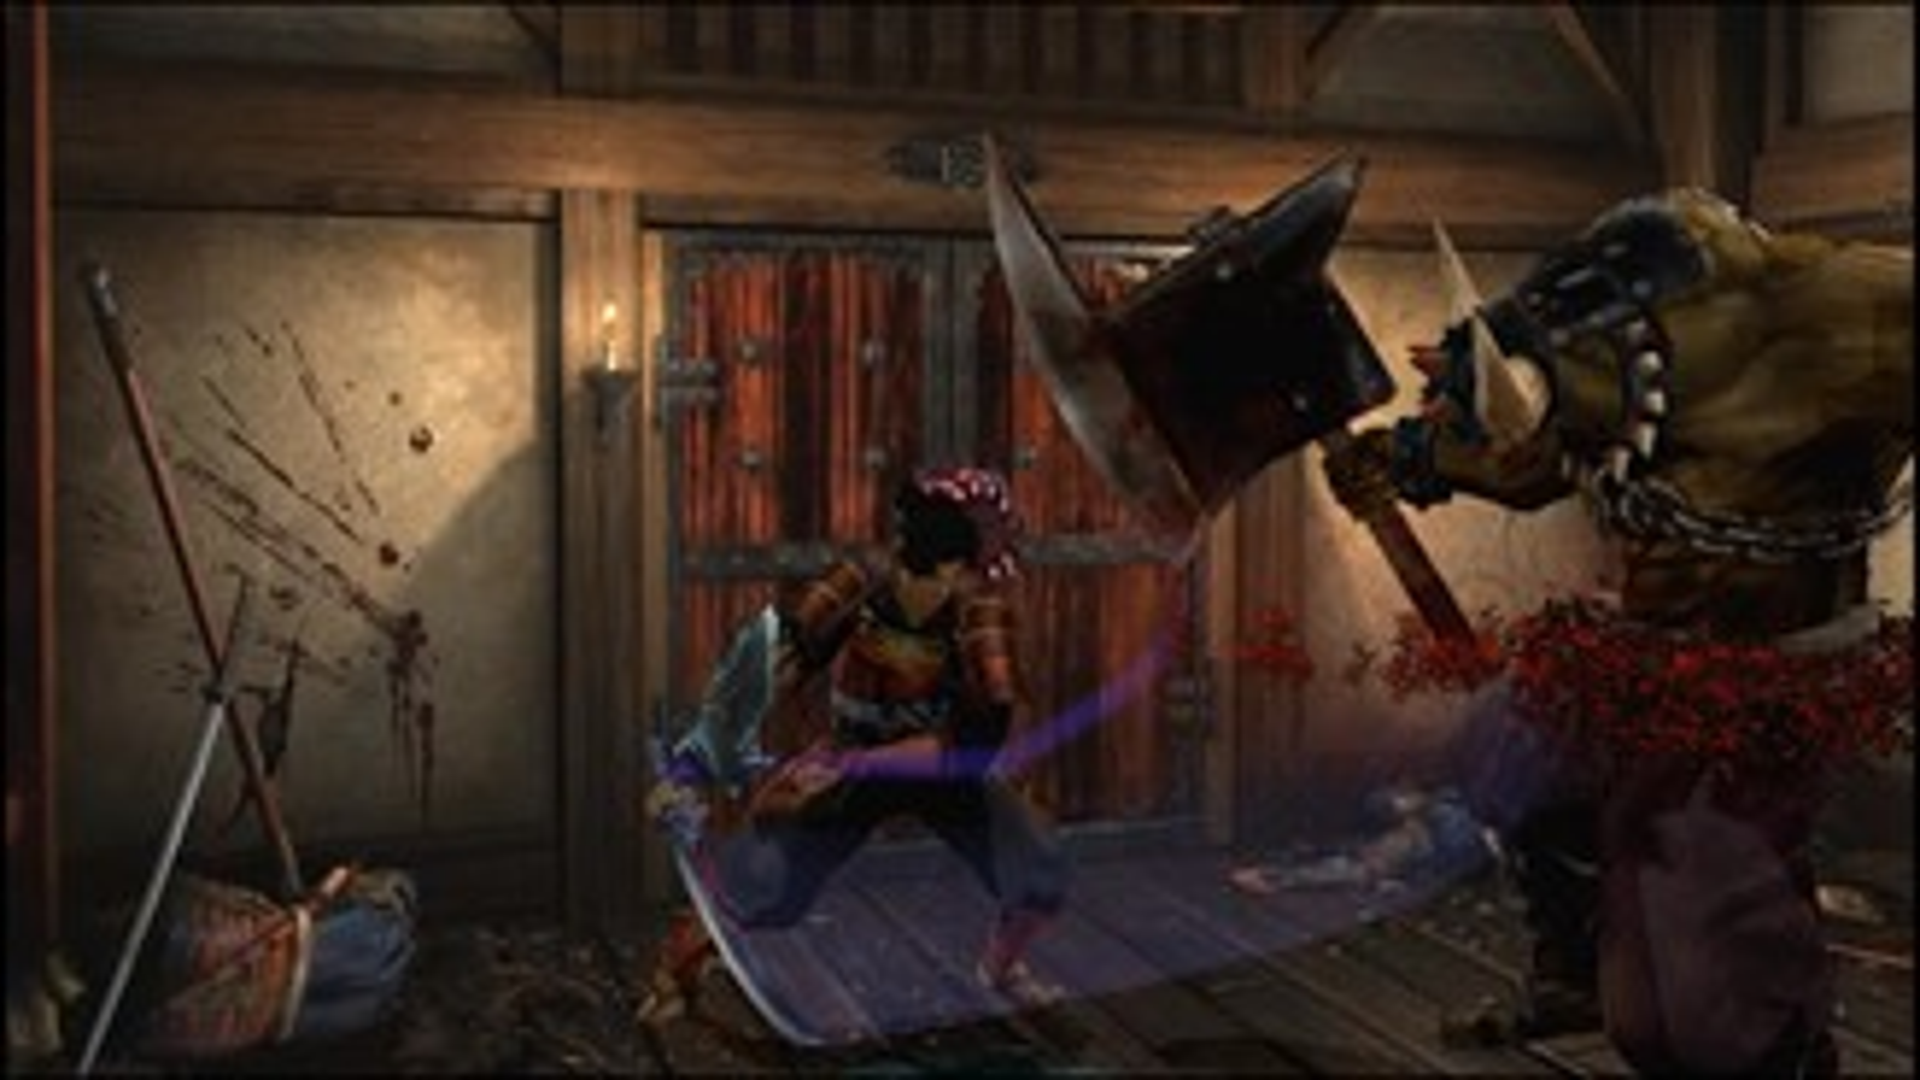 Onimusha franchise hasn't won a new game since the PlayStation 2 era